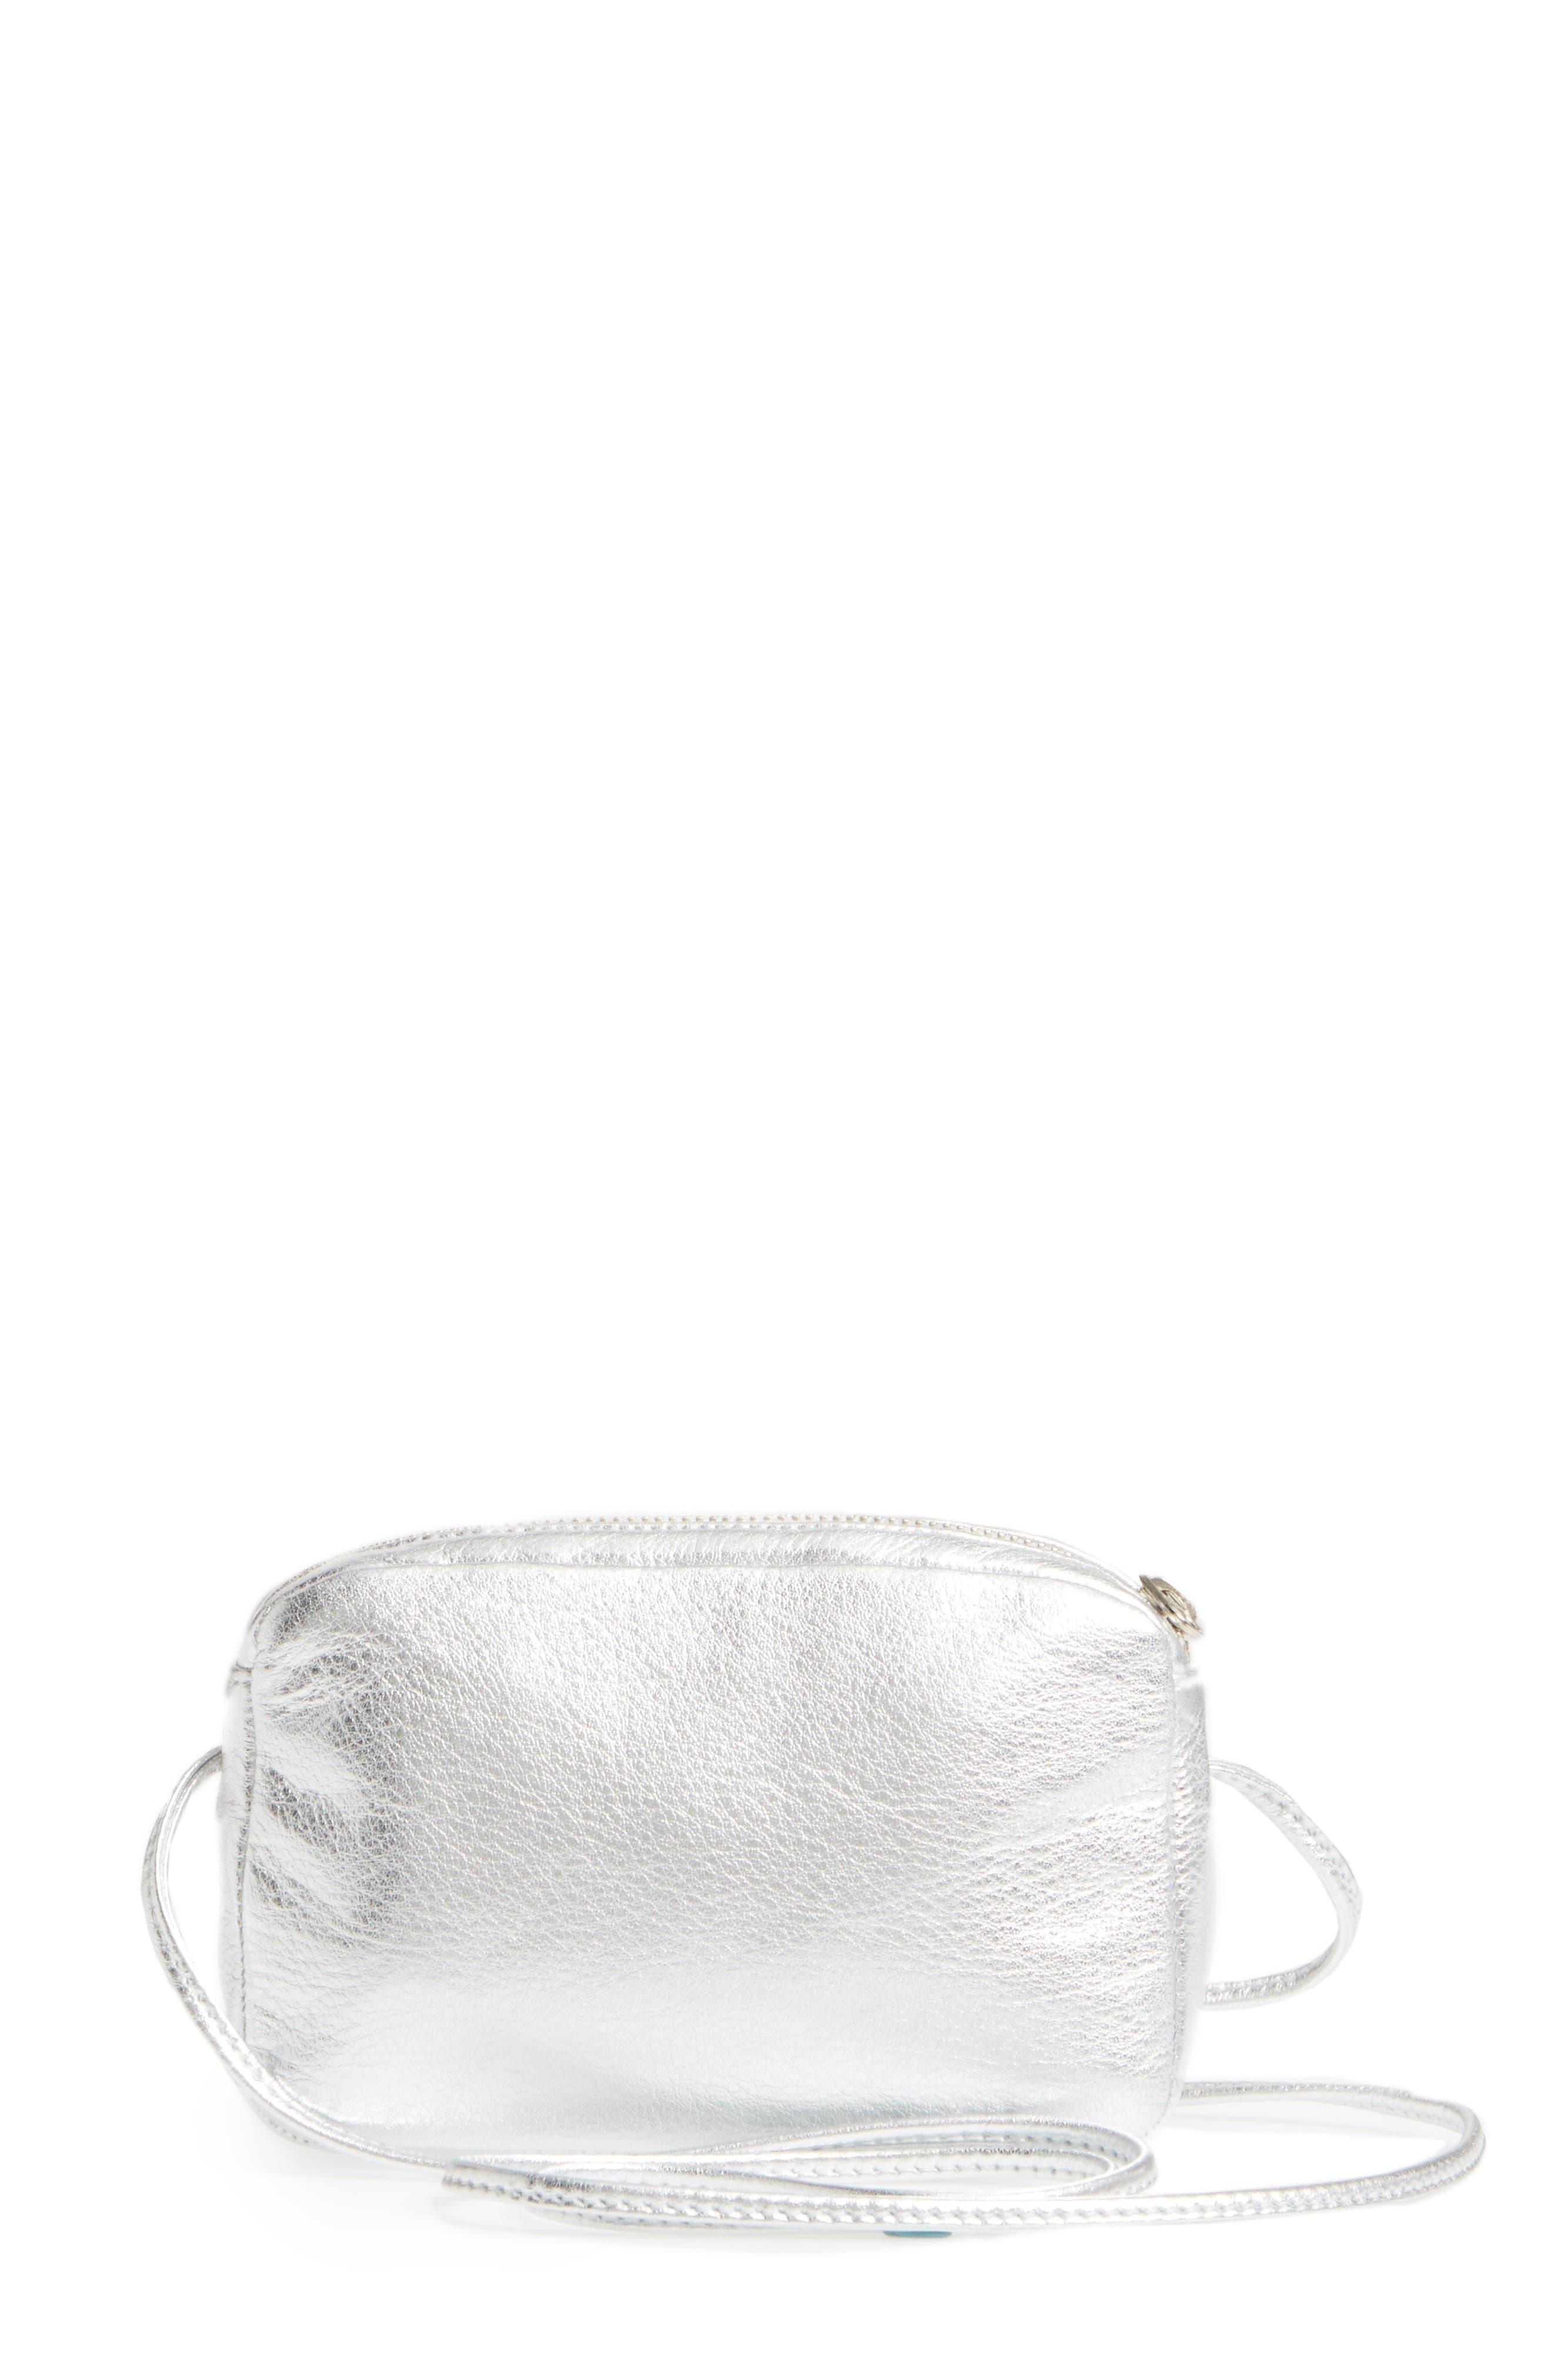 'Mini' Pebbled Leather Crossbody,                         Main,                         color, Silver